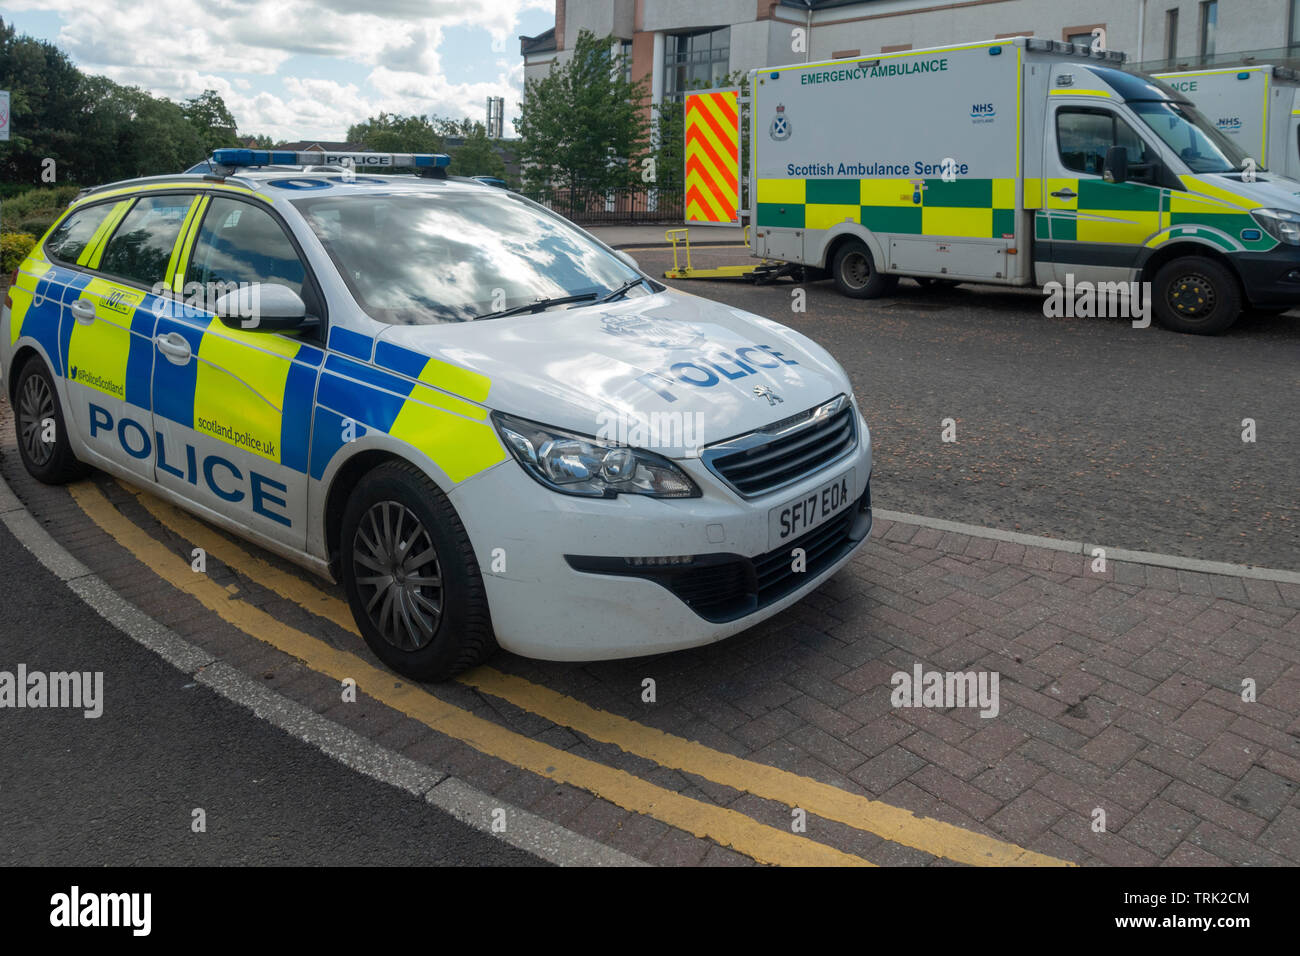 A Police Car and an Emergency Ambulance parked outside the Accident and Emergency Unit of University Hospital, Wishaw, North Lanarkshire, Scotland, UK - Stock Image